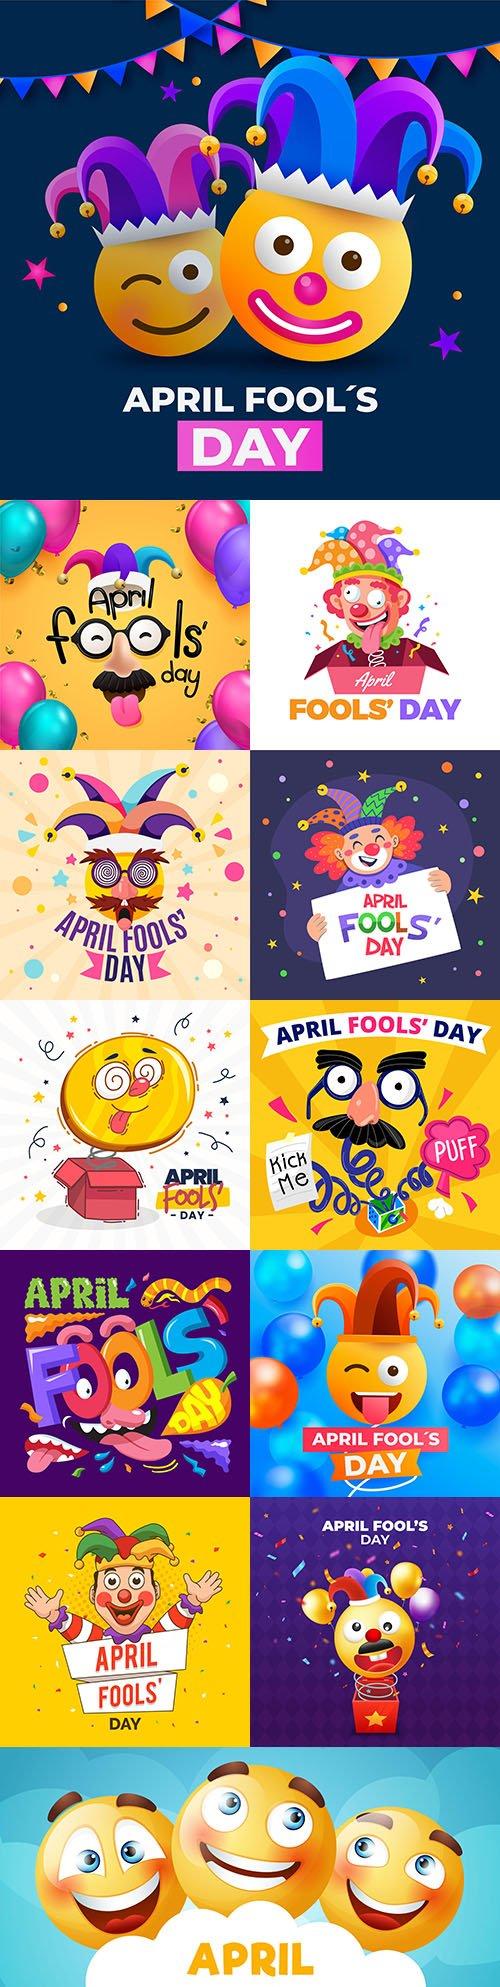 Fools day and April 1 illustration flat design